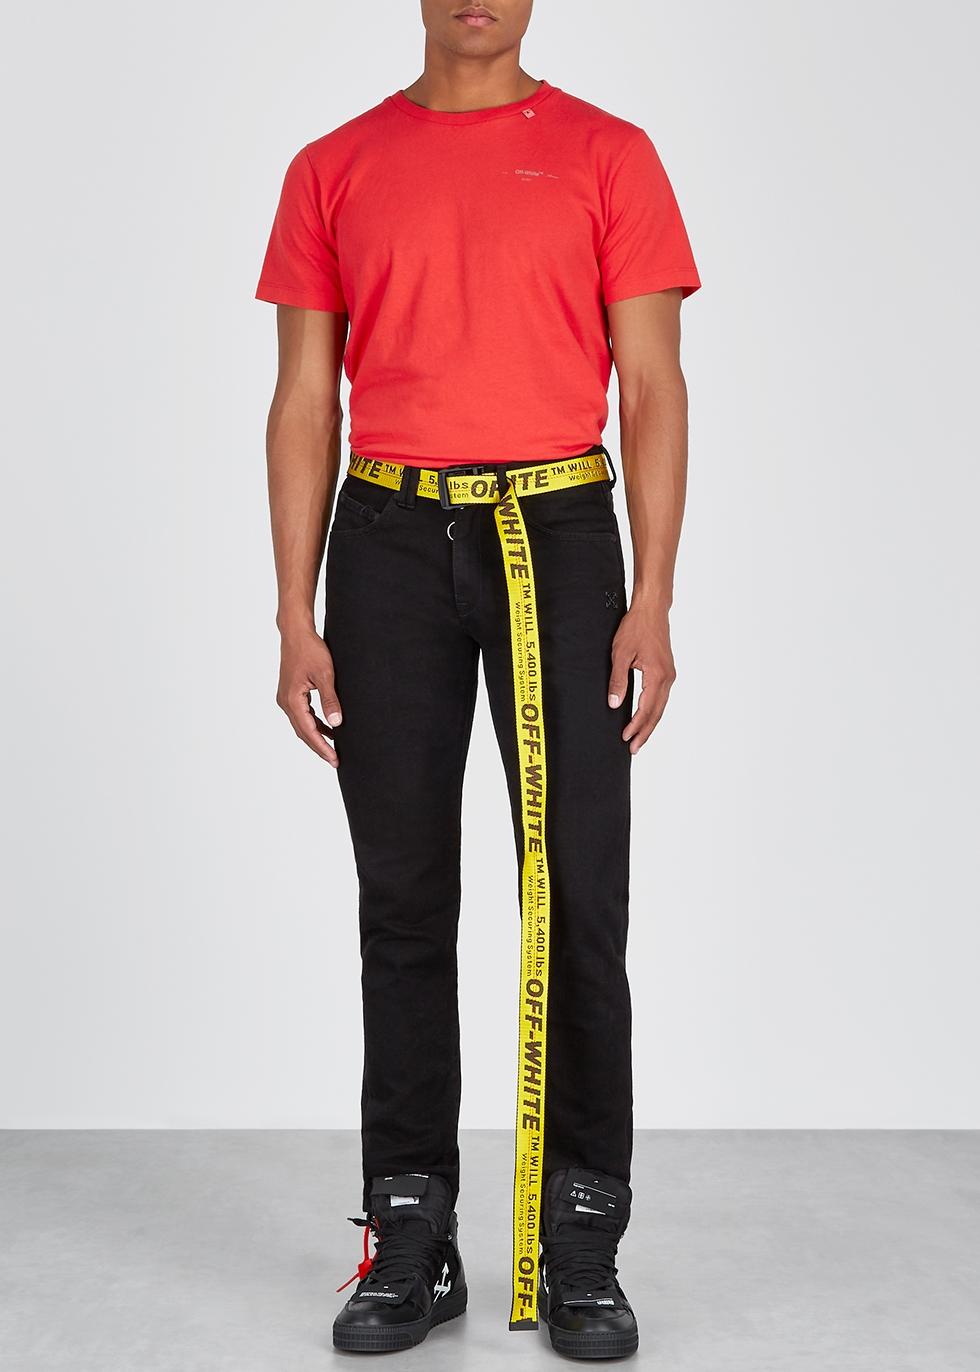 70e57276f Men's Designer Belts and Accessories - Harvey Nichols